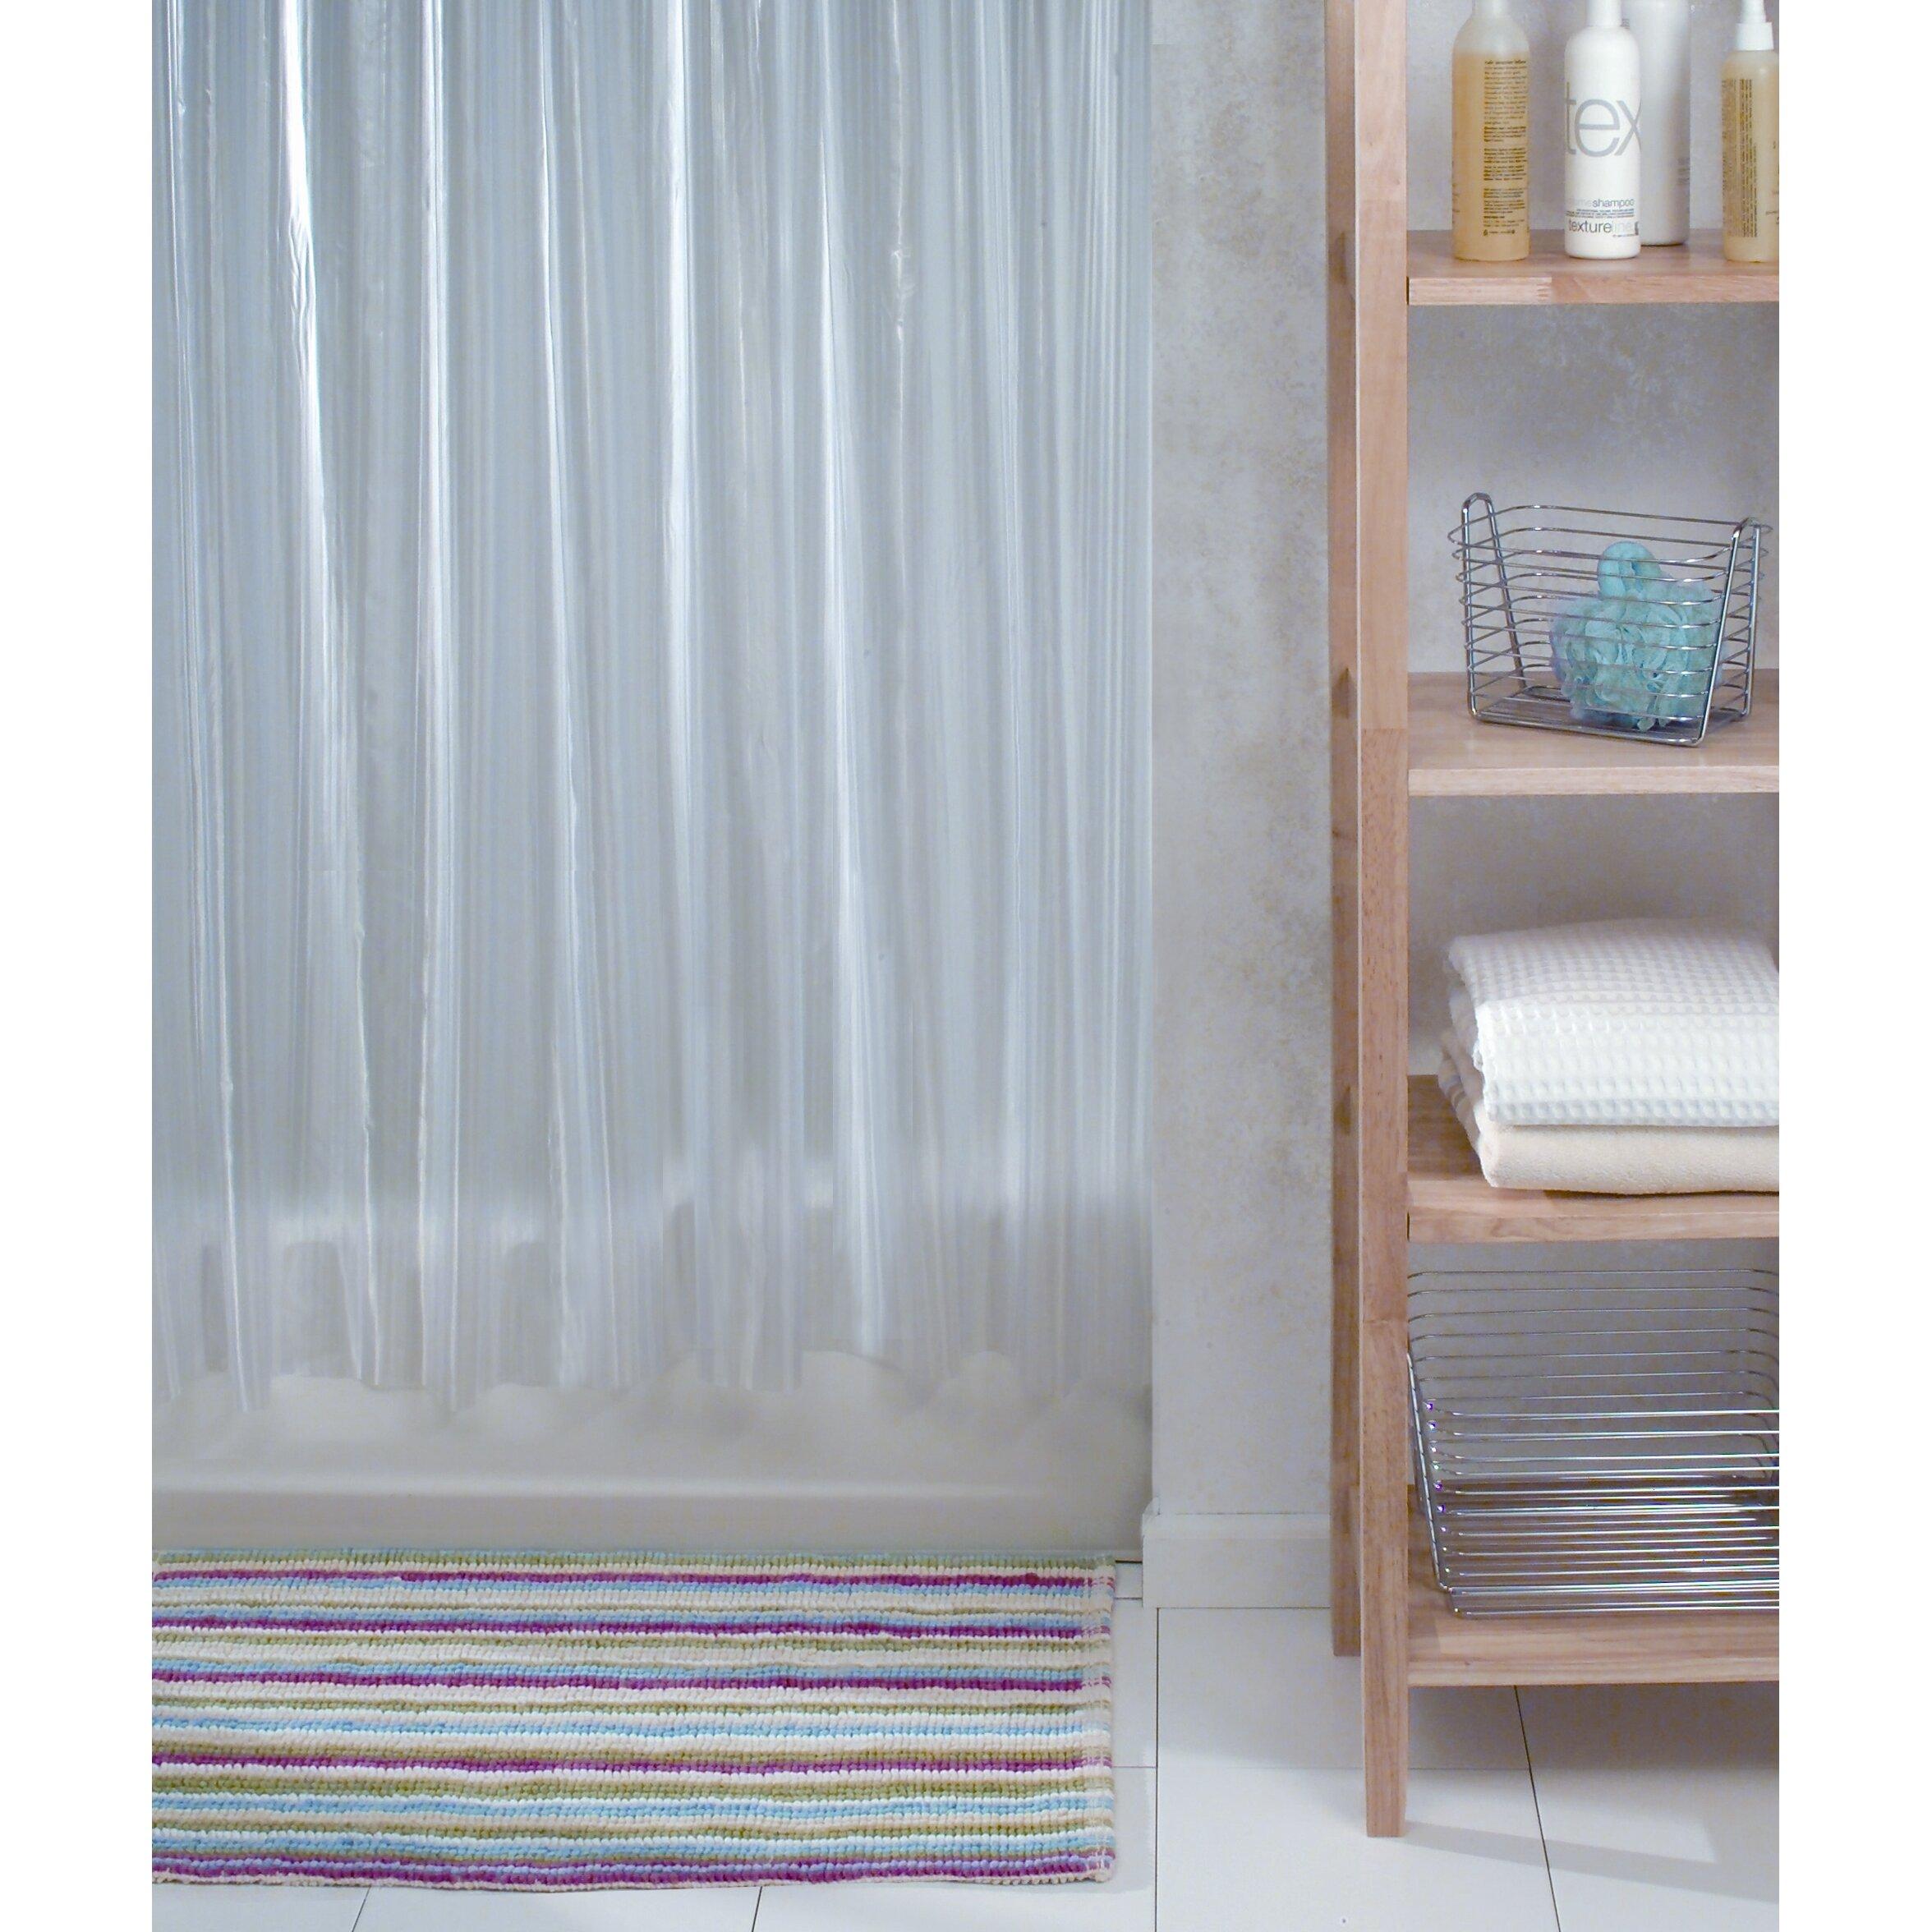 Interdesign zia vinyl shower curtain reviews for Vinyl window designs complaints